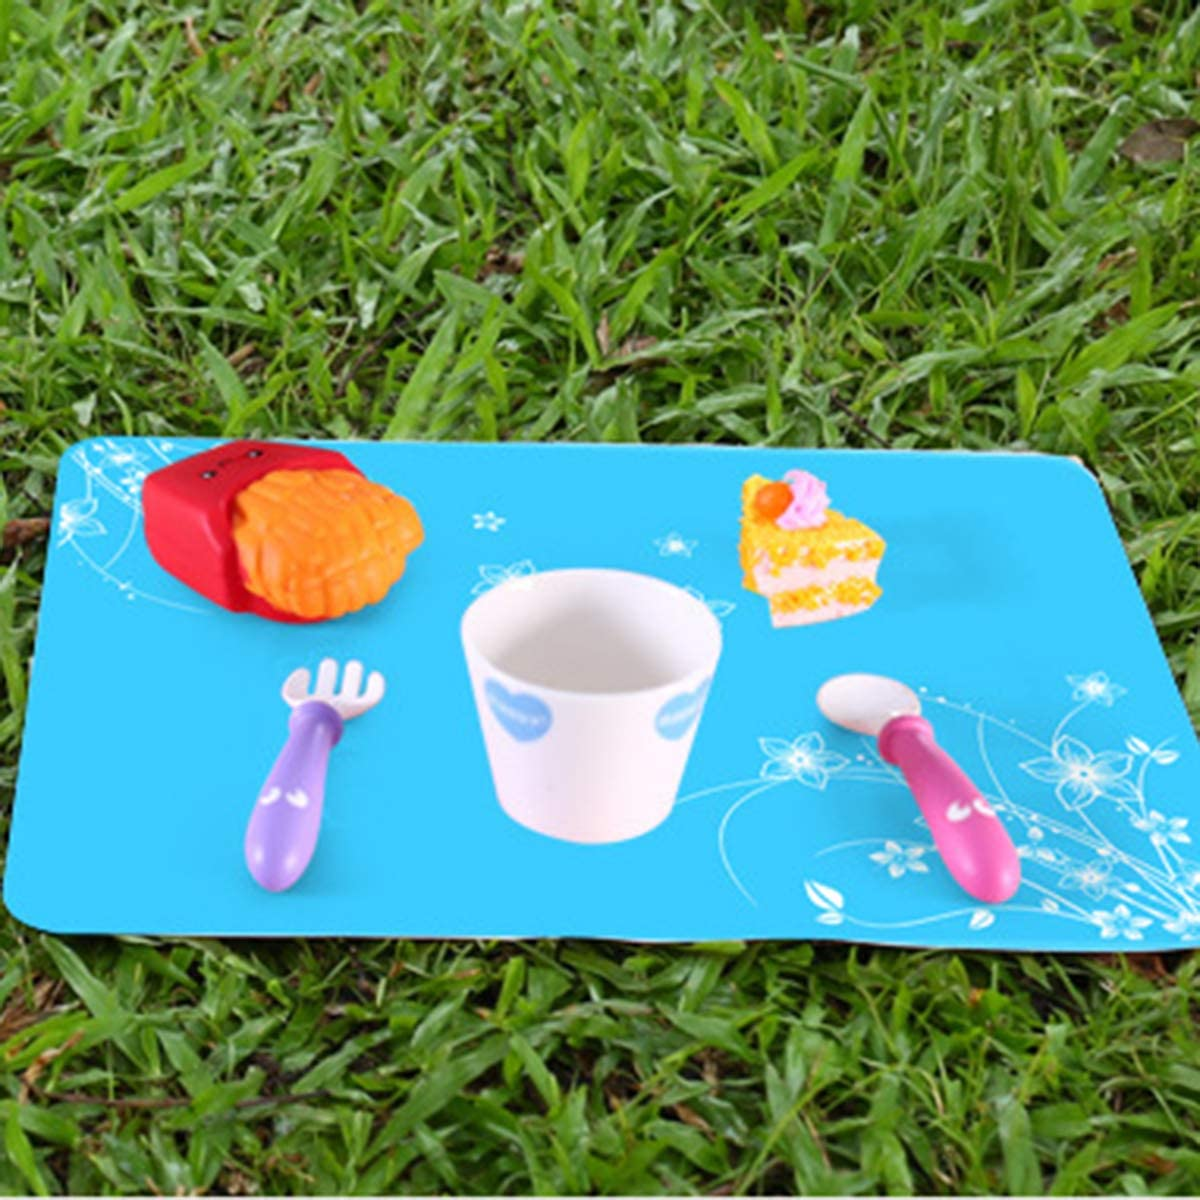 4 Piezas de Caf/é DaMohony Manteles Individuales Manteles Individuales de Silicona Aislantes Antideslizantes Esteras para Hornear Mesas Posavasos.